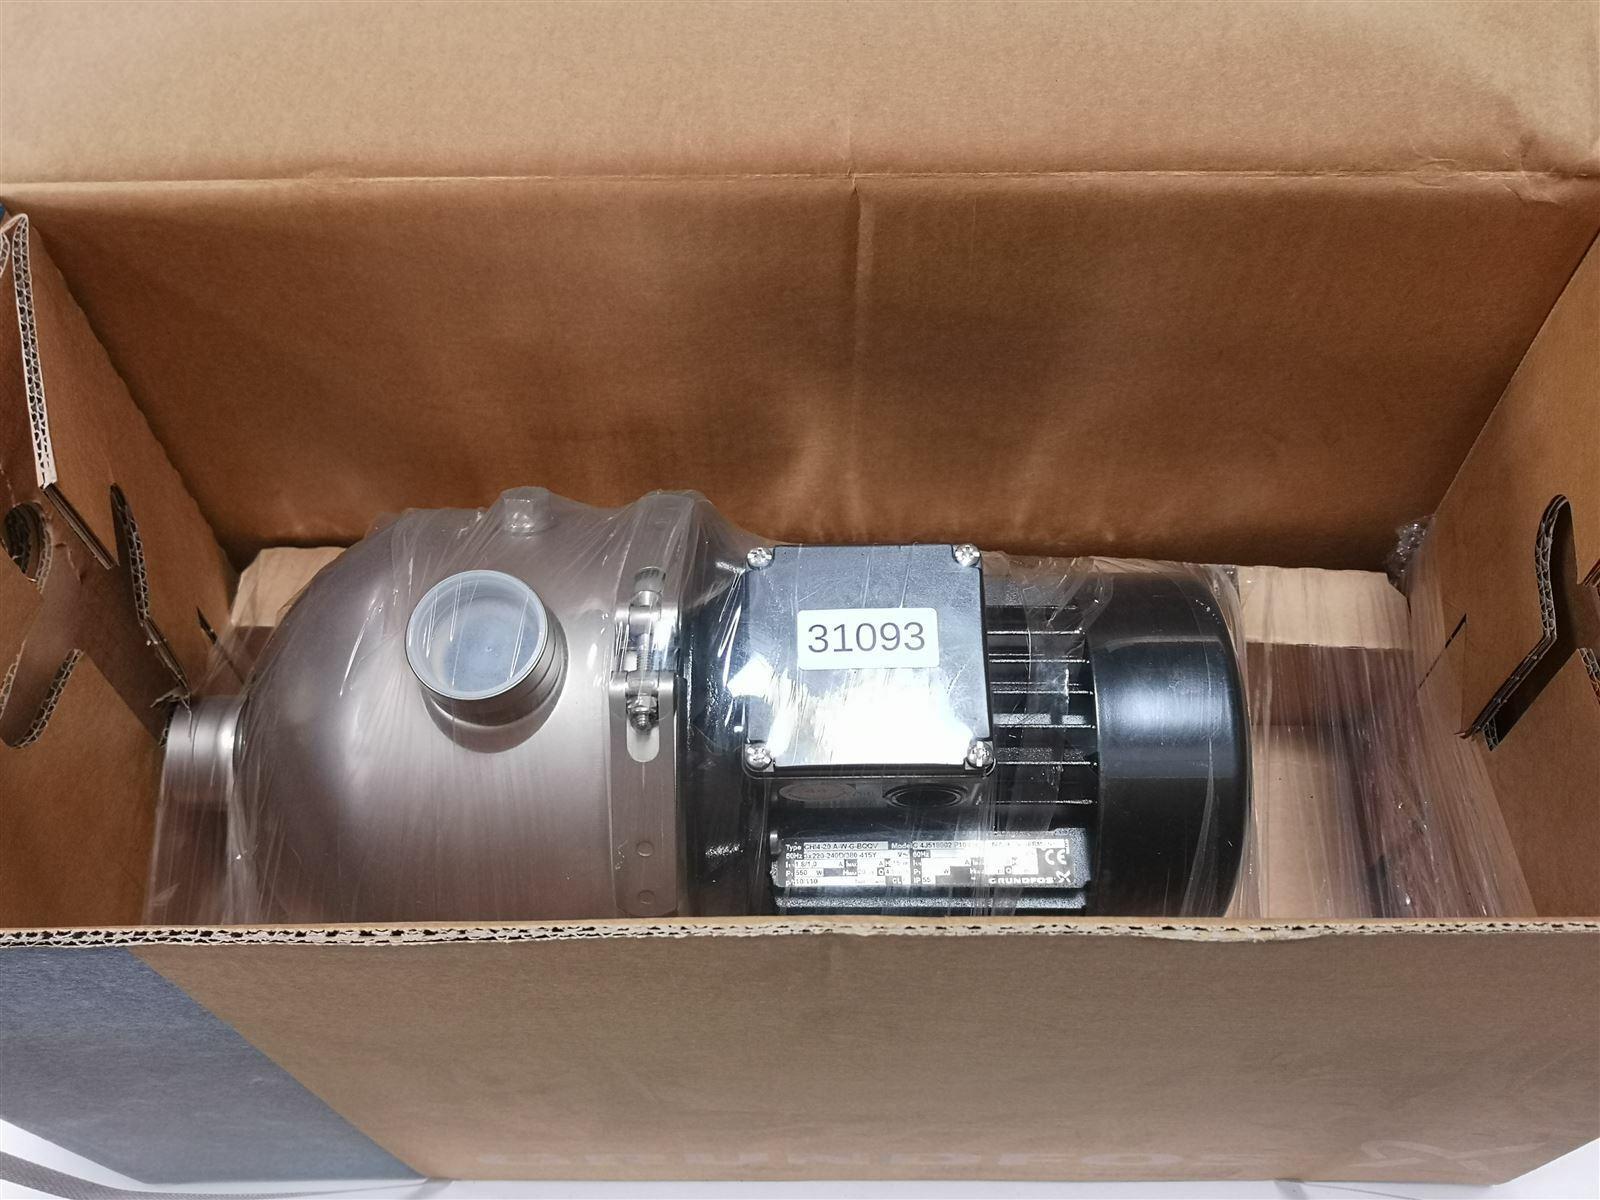 Grundfos CHI4-20 A-W-G-BQQV Pump Rotary Pump